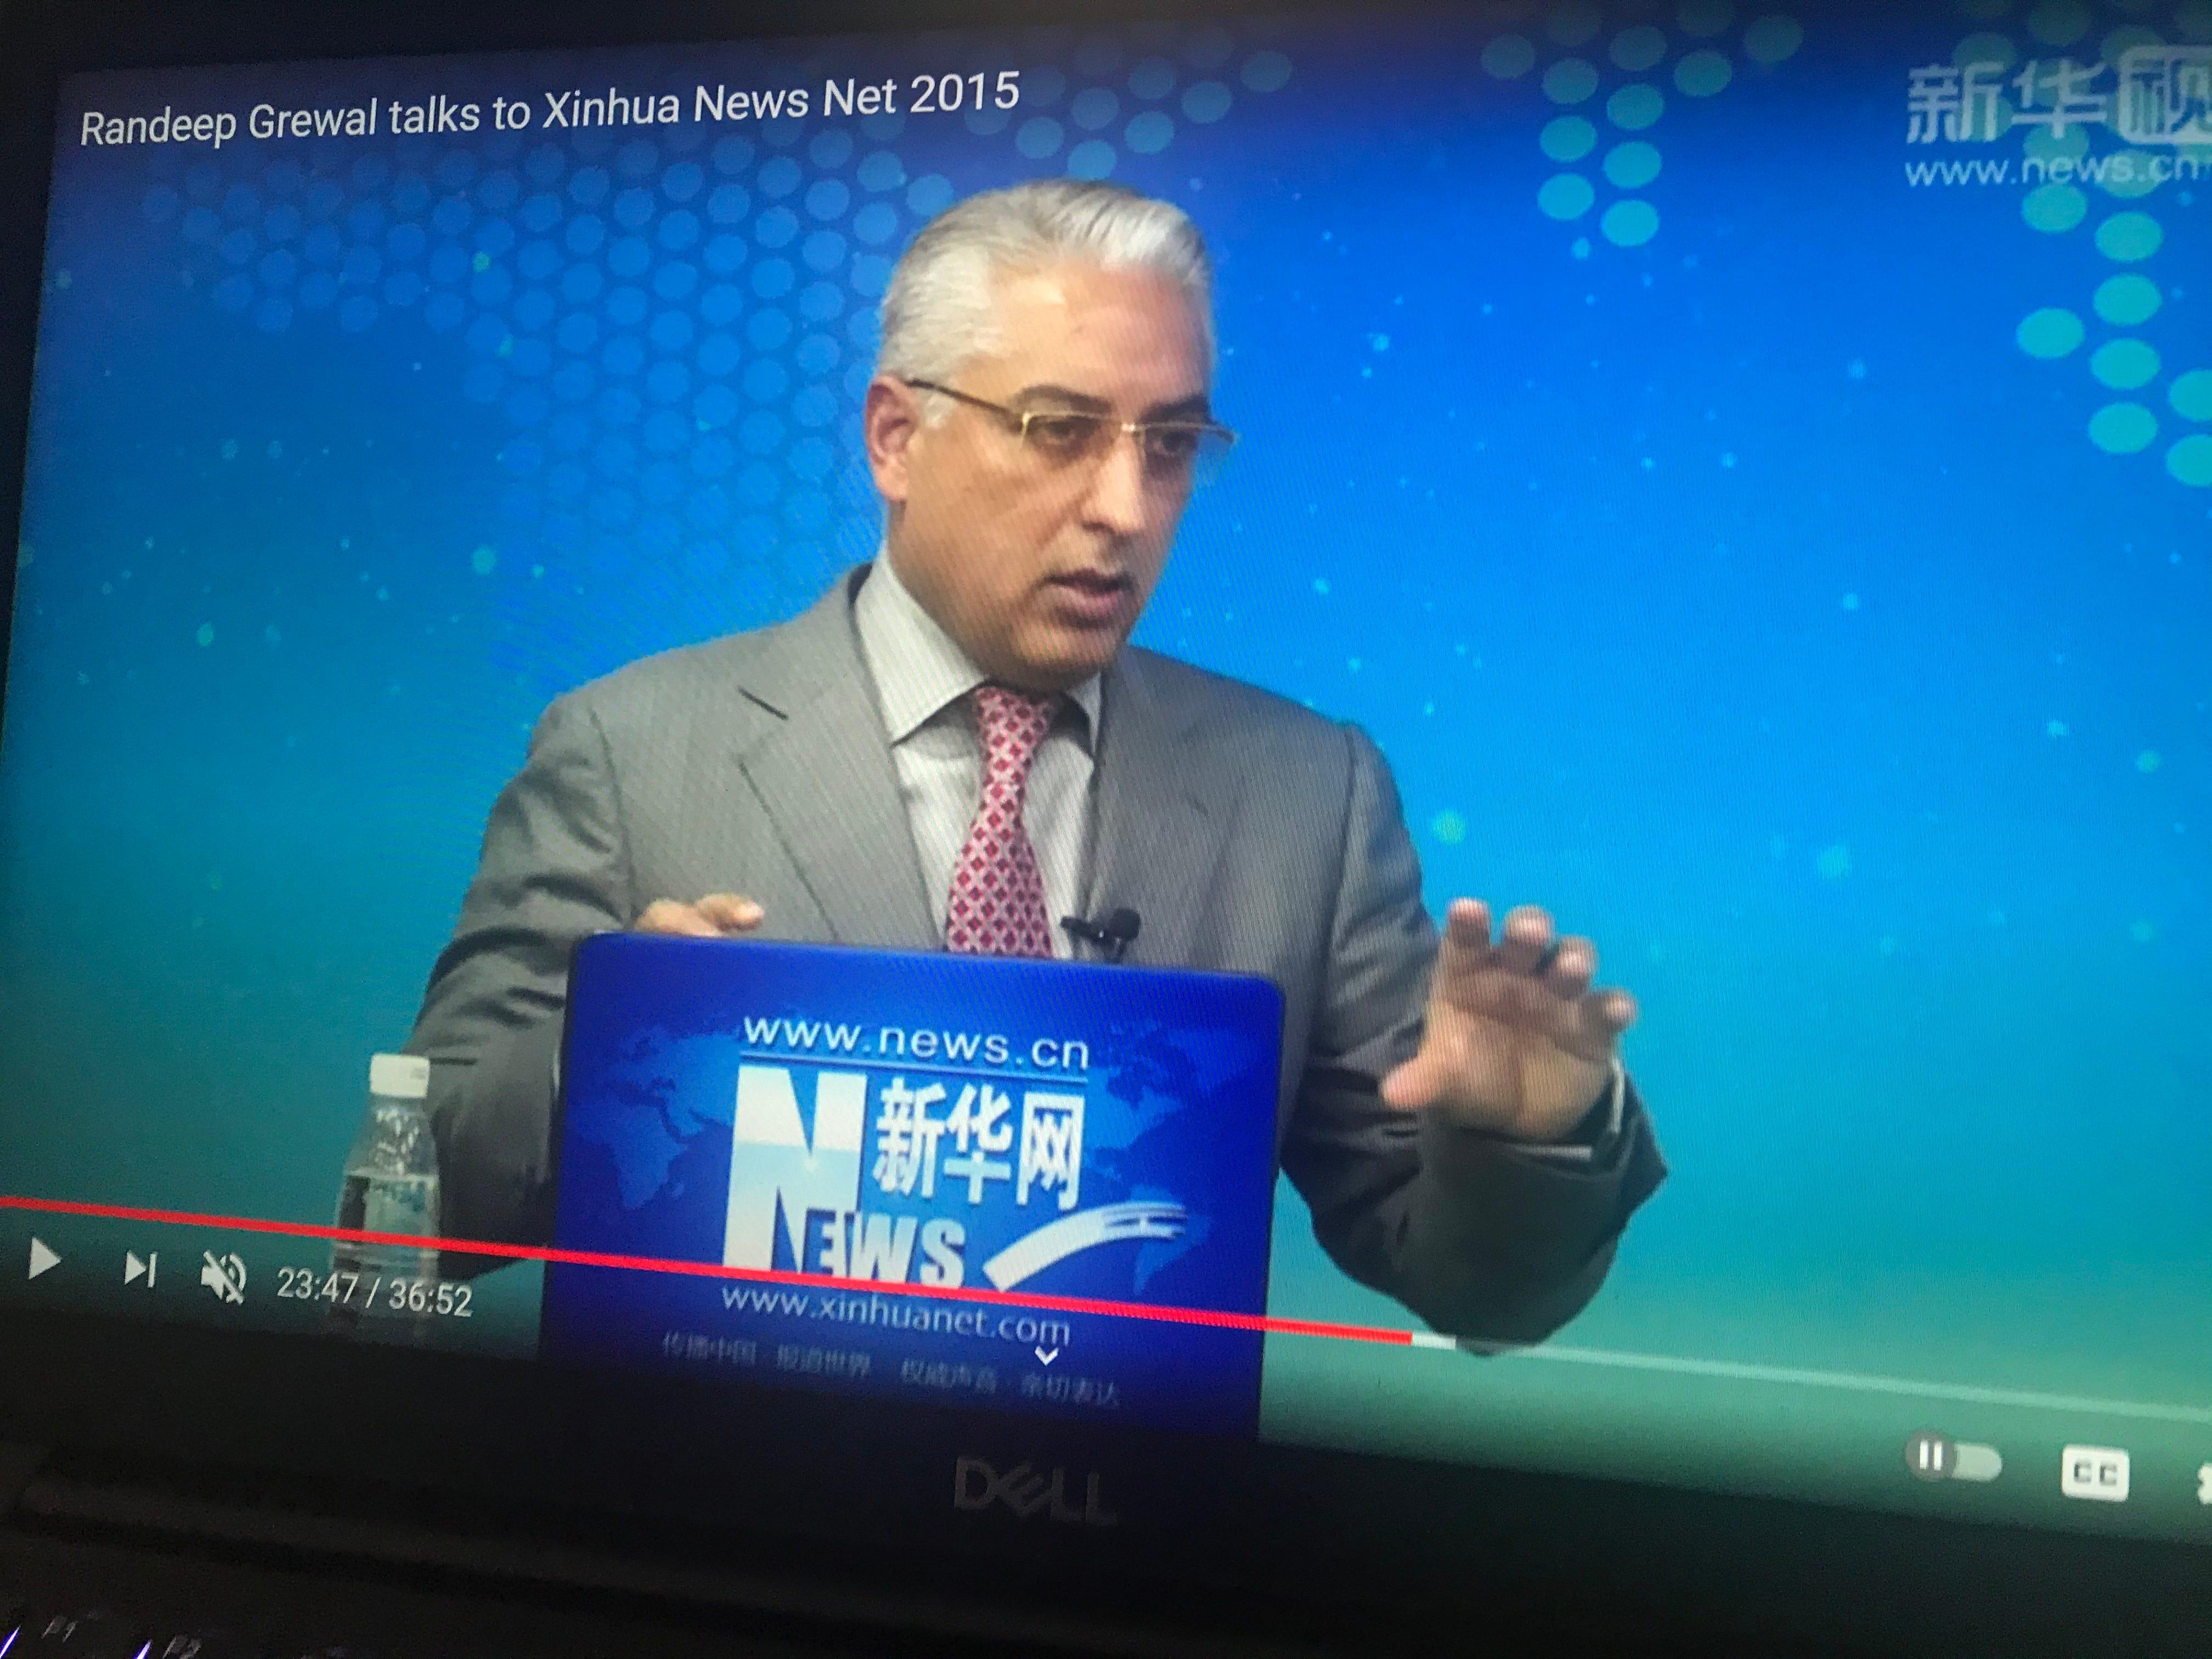 In this screenshot, Randeep Grewal appears on a Chinese state-run Xinhua News program.